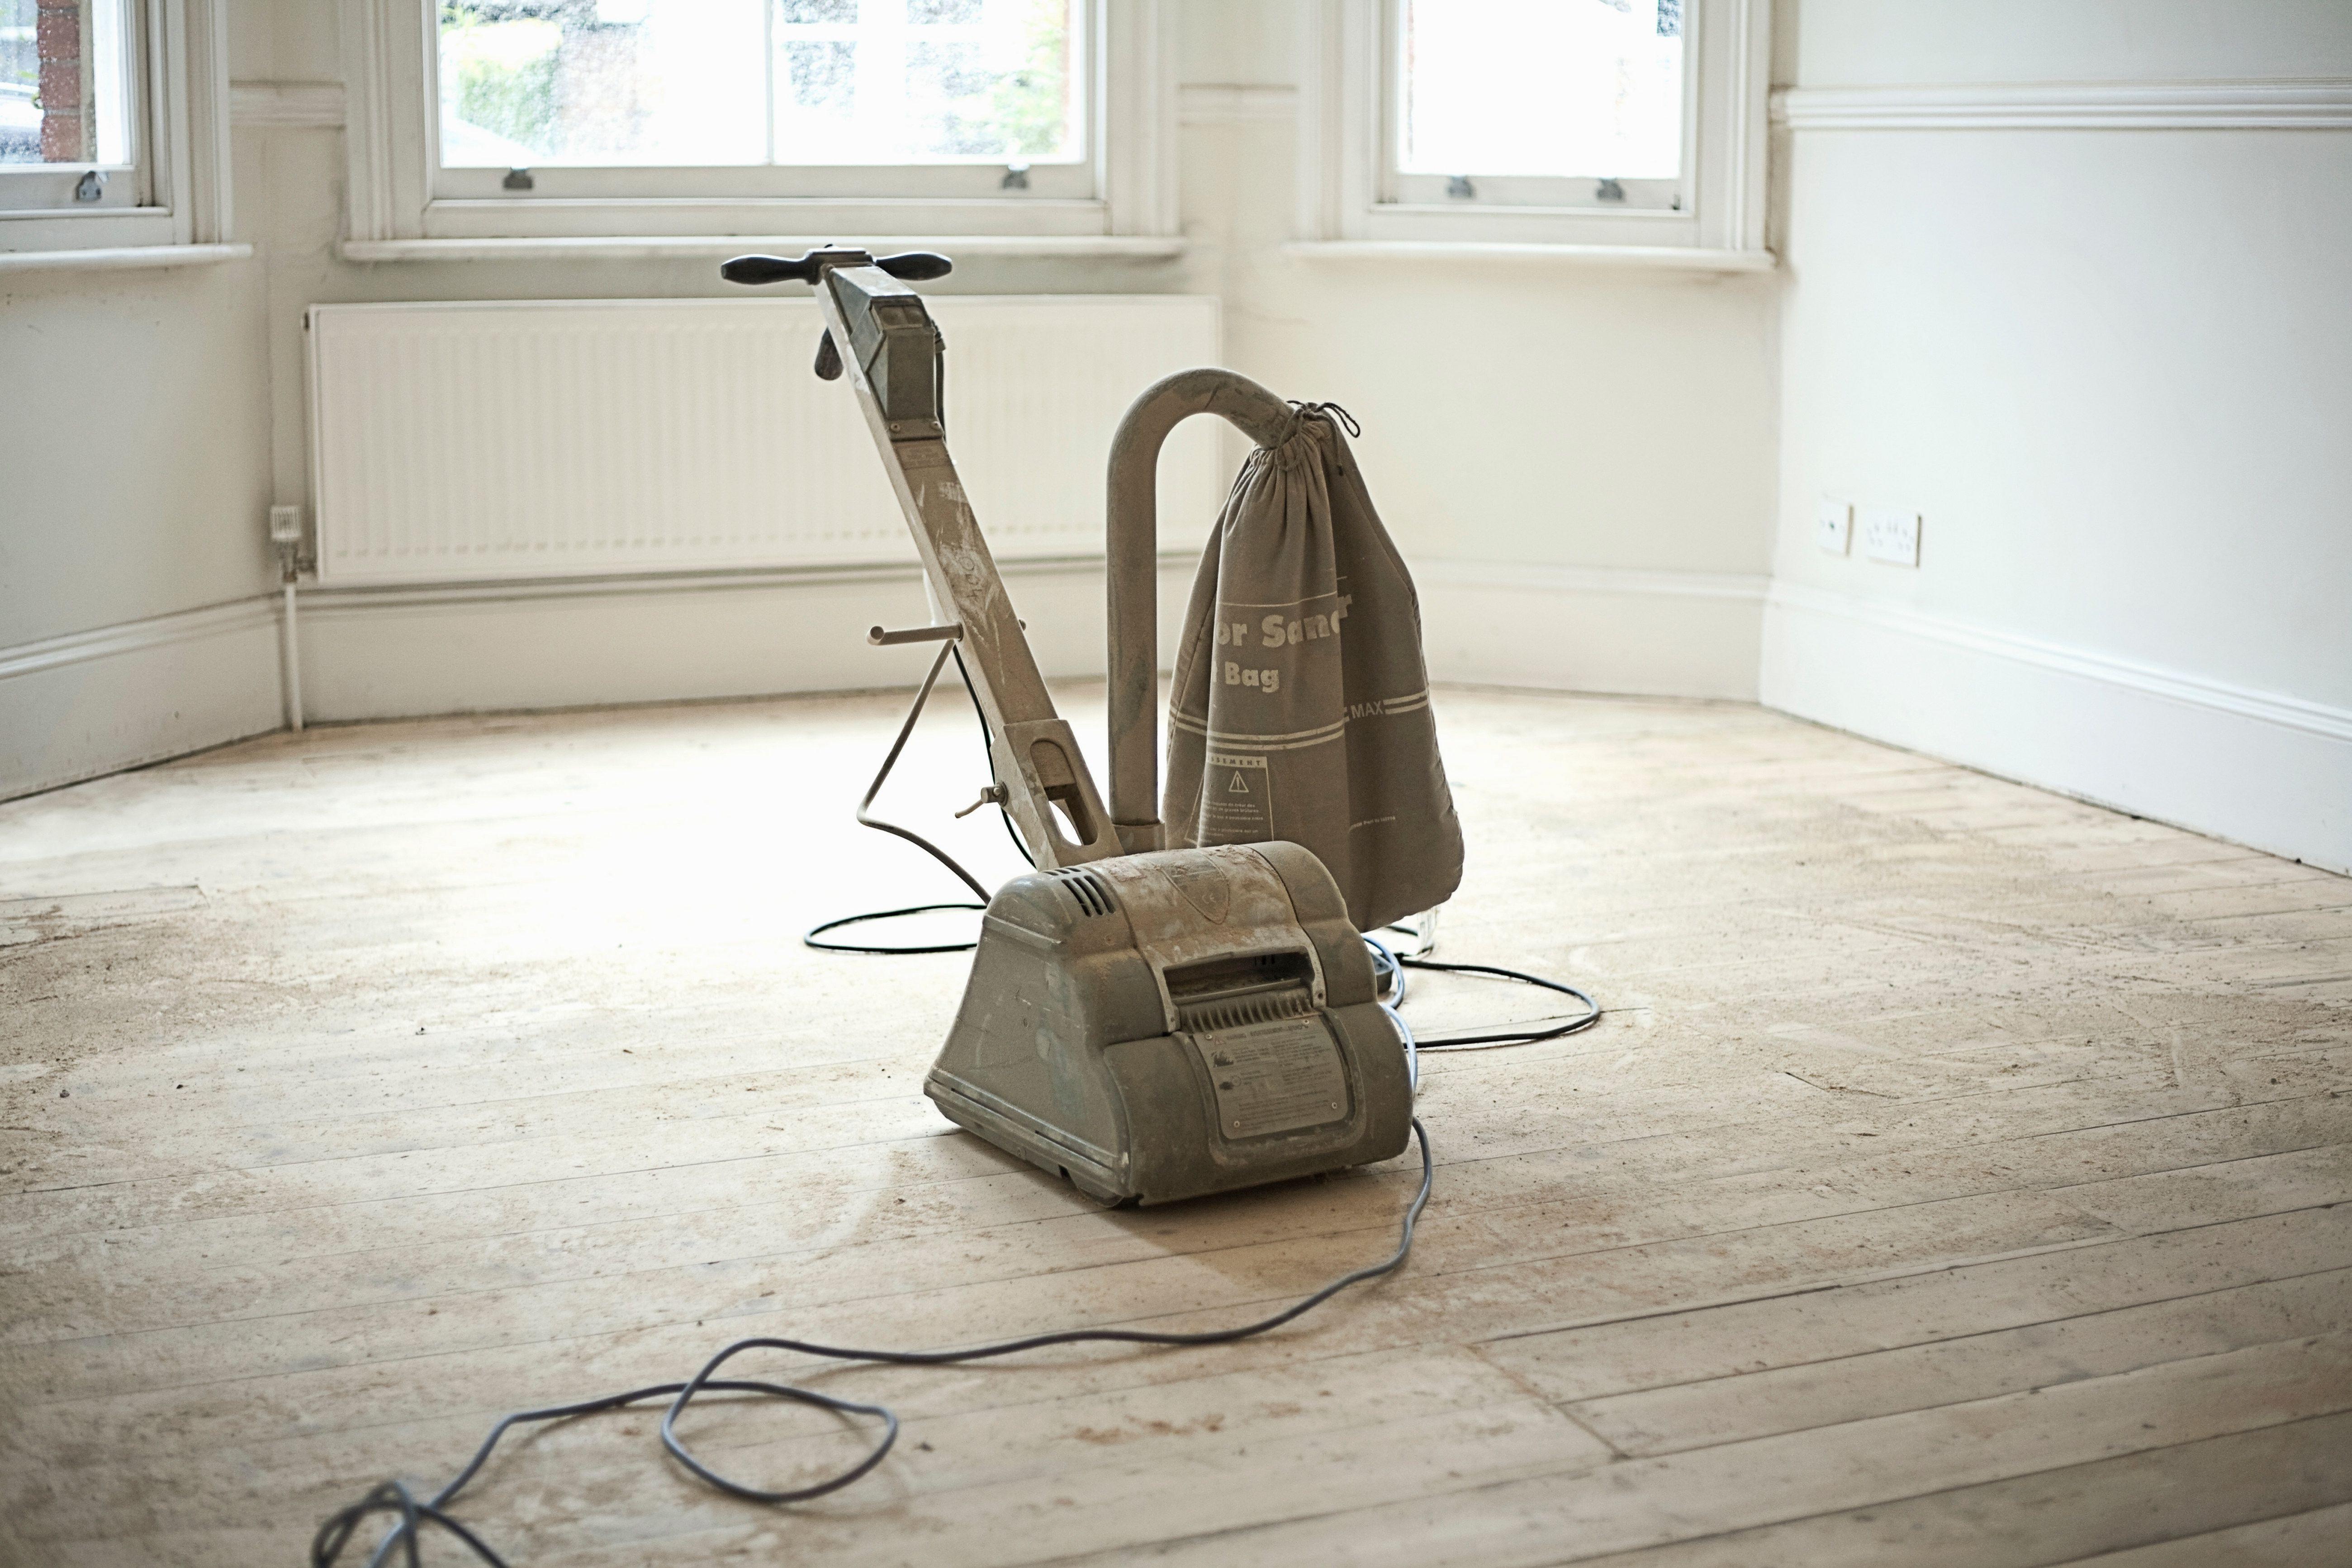 sanding and refinishing hardwood floors of floor sanders to rent when finishing your wood floor regarding sander on wooden floorboards of new home 179707189 588760815f9b58bdb3fed440